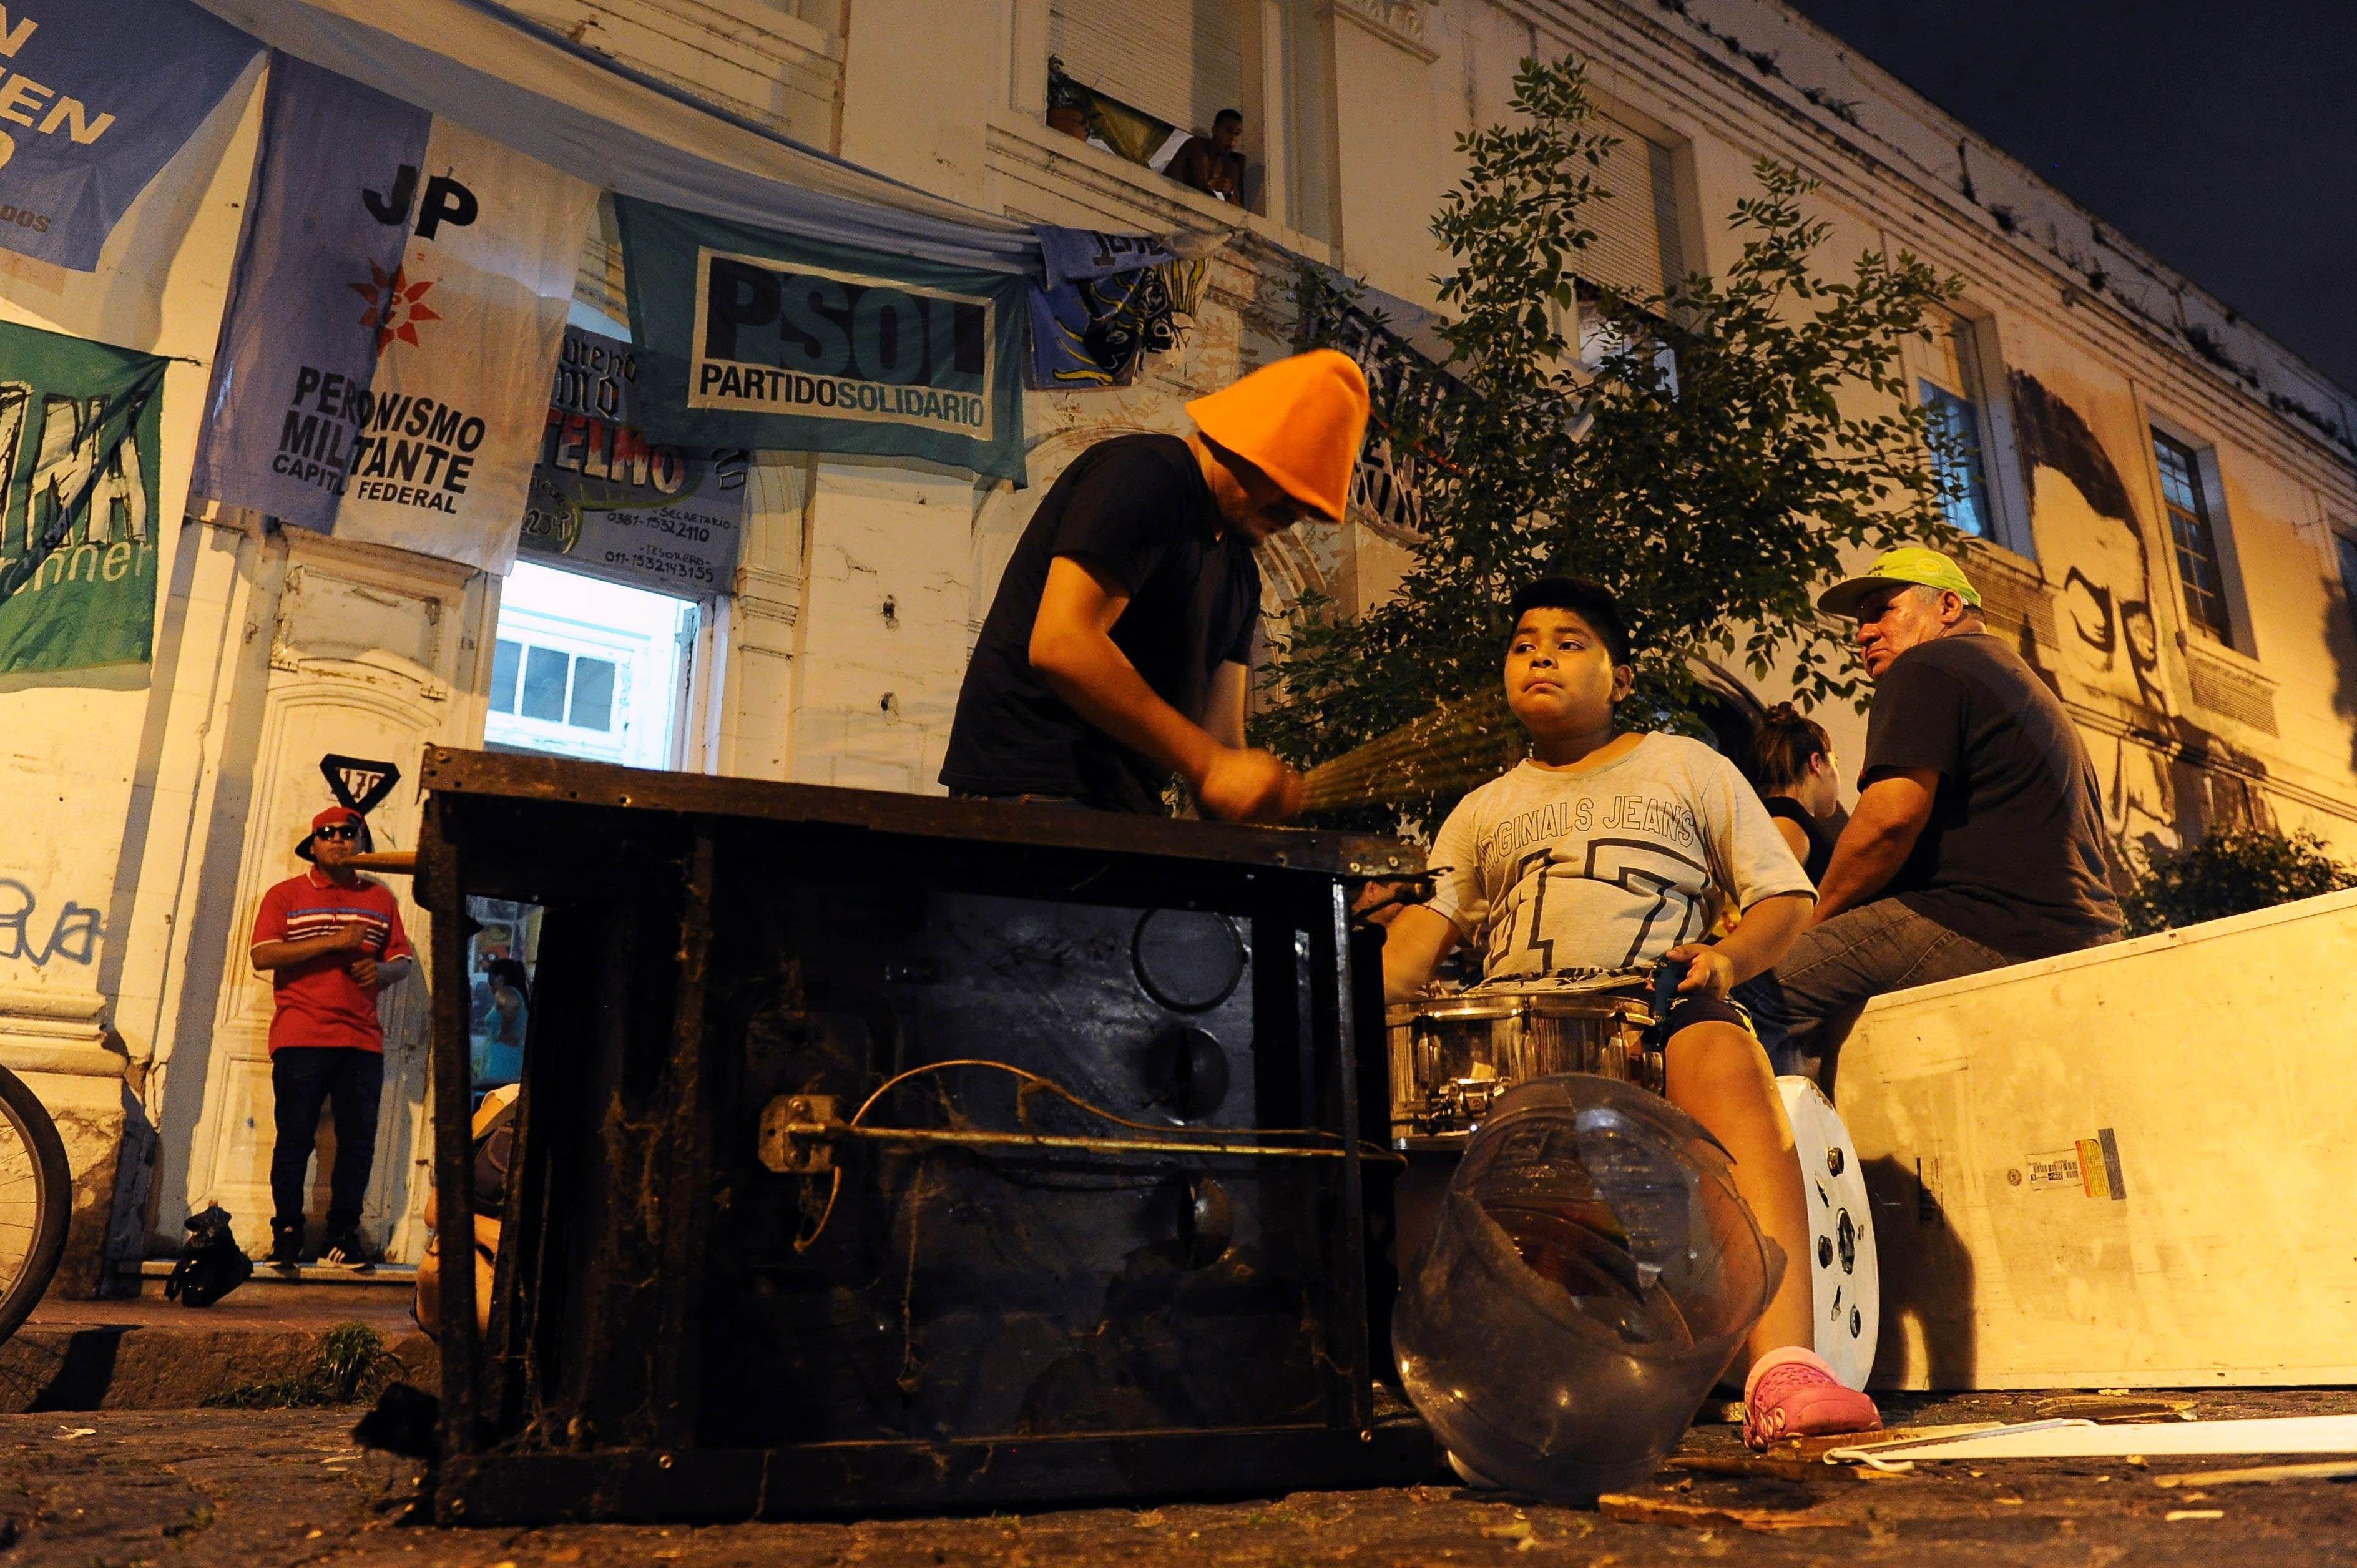 60 familias desalojadas en el ex Padelai